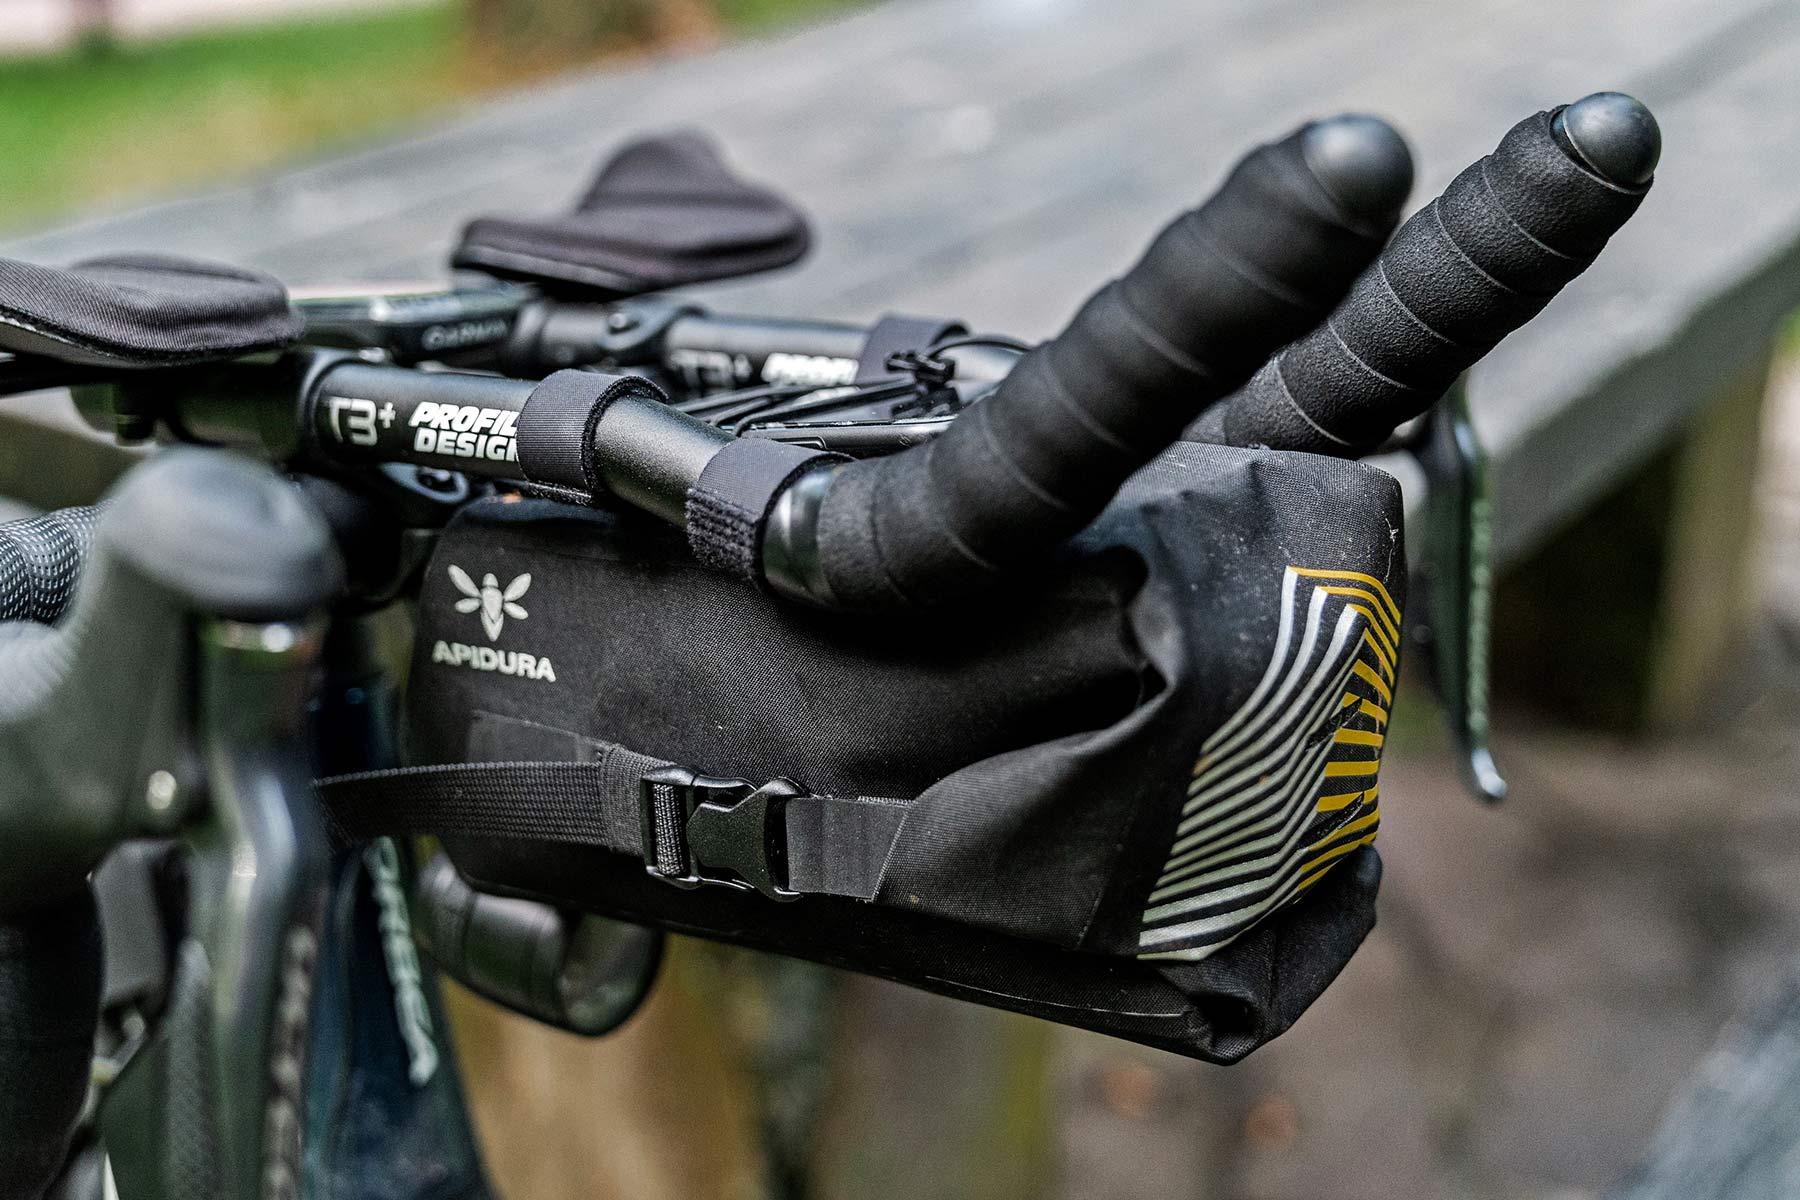 Apidura Racing Aerobar Pack out-front aero bar extension bikepacking bag, angled